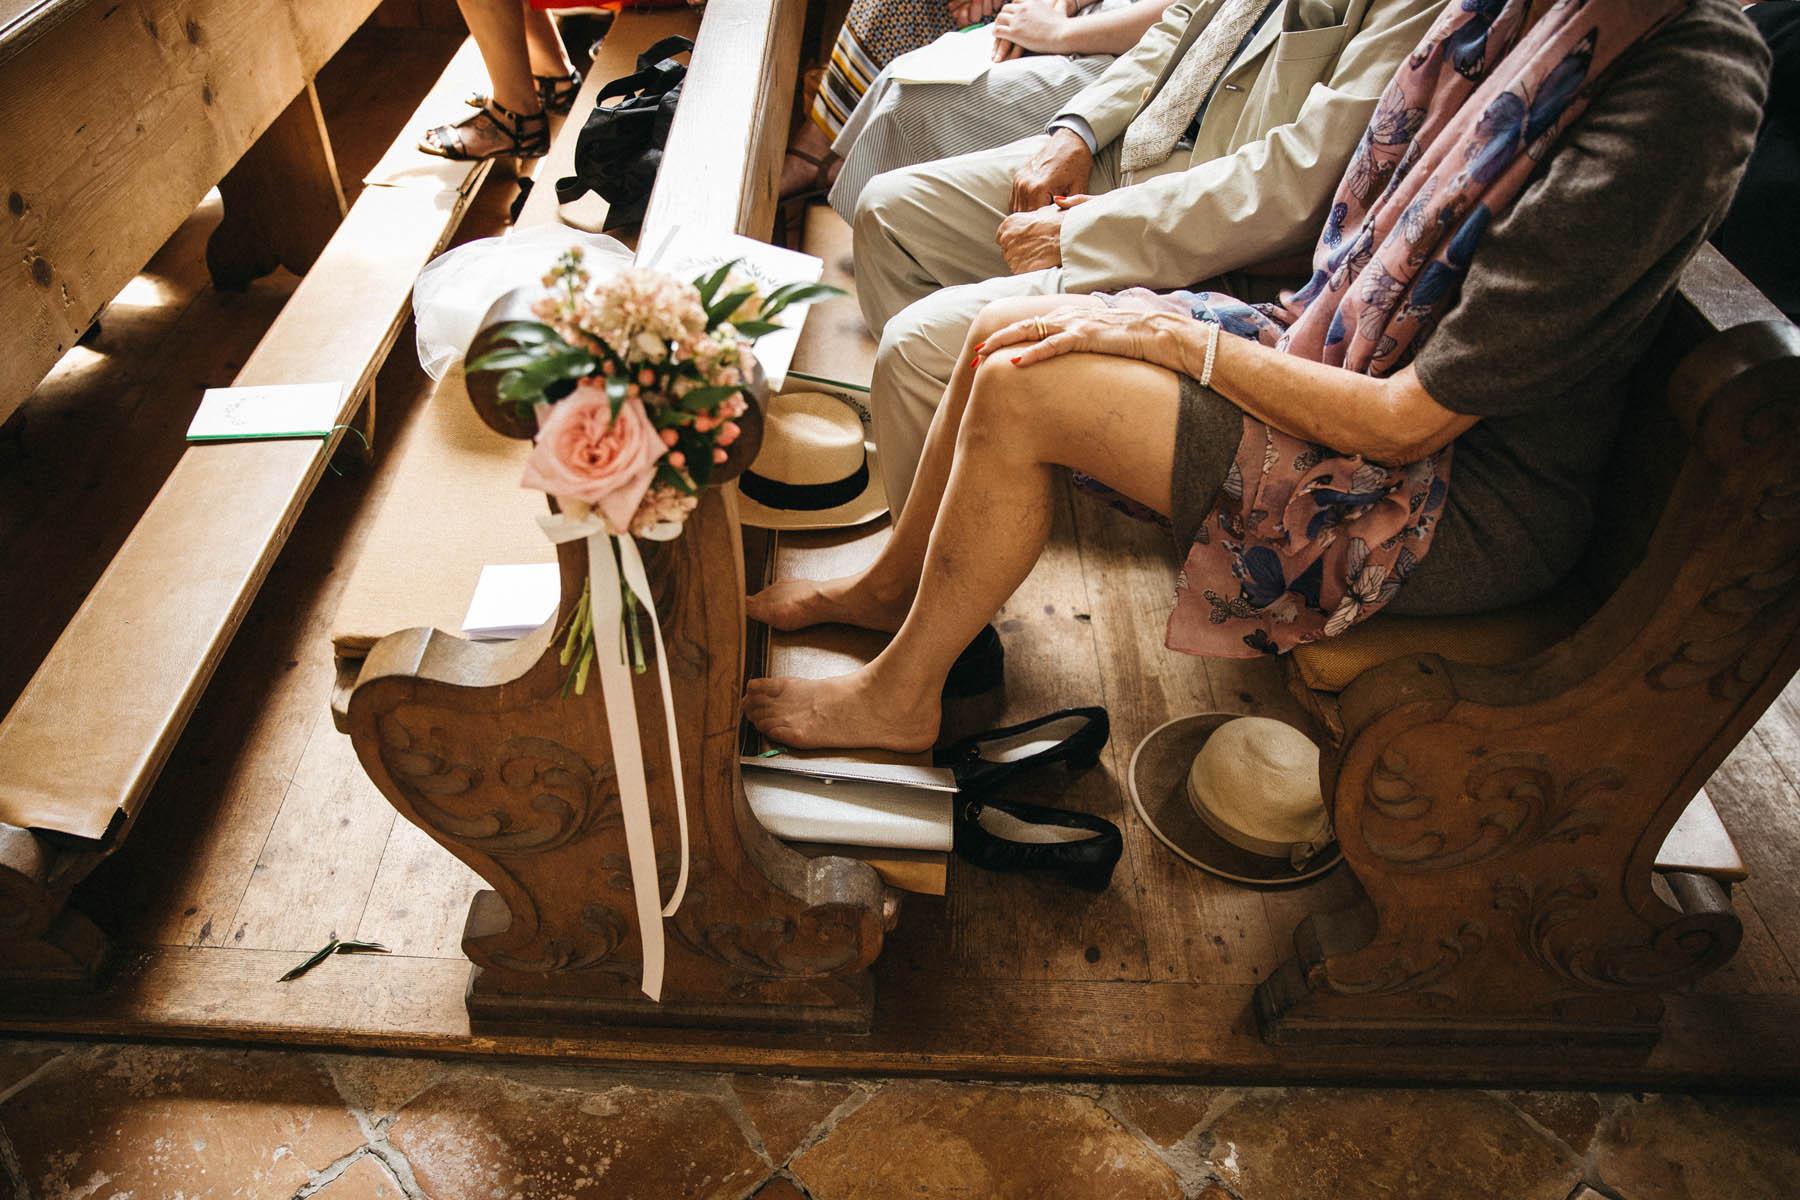 raissa simon fotografie hochzeit vintage starnberger see la villa 063 - Patricia + Maximilian